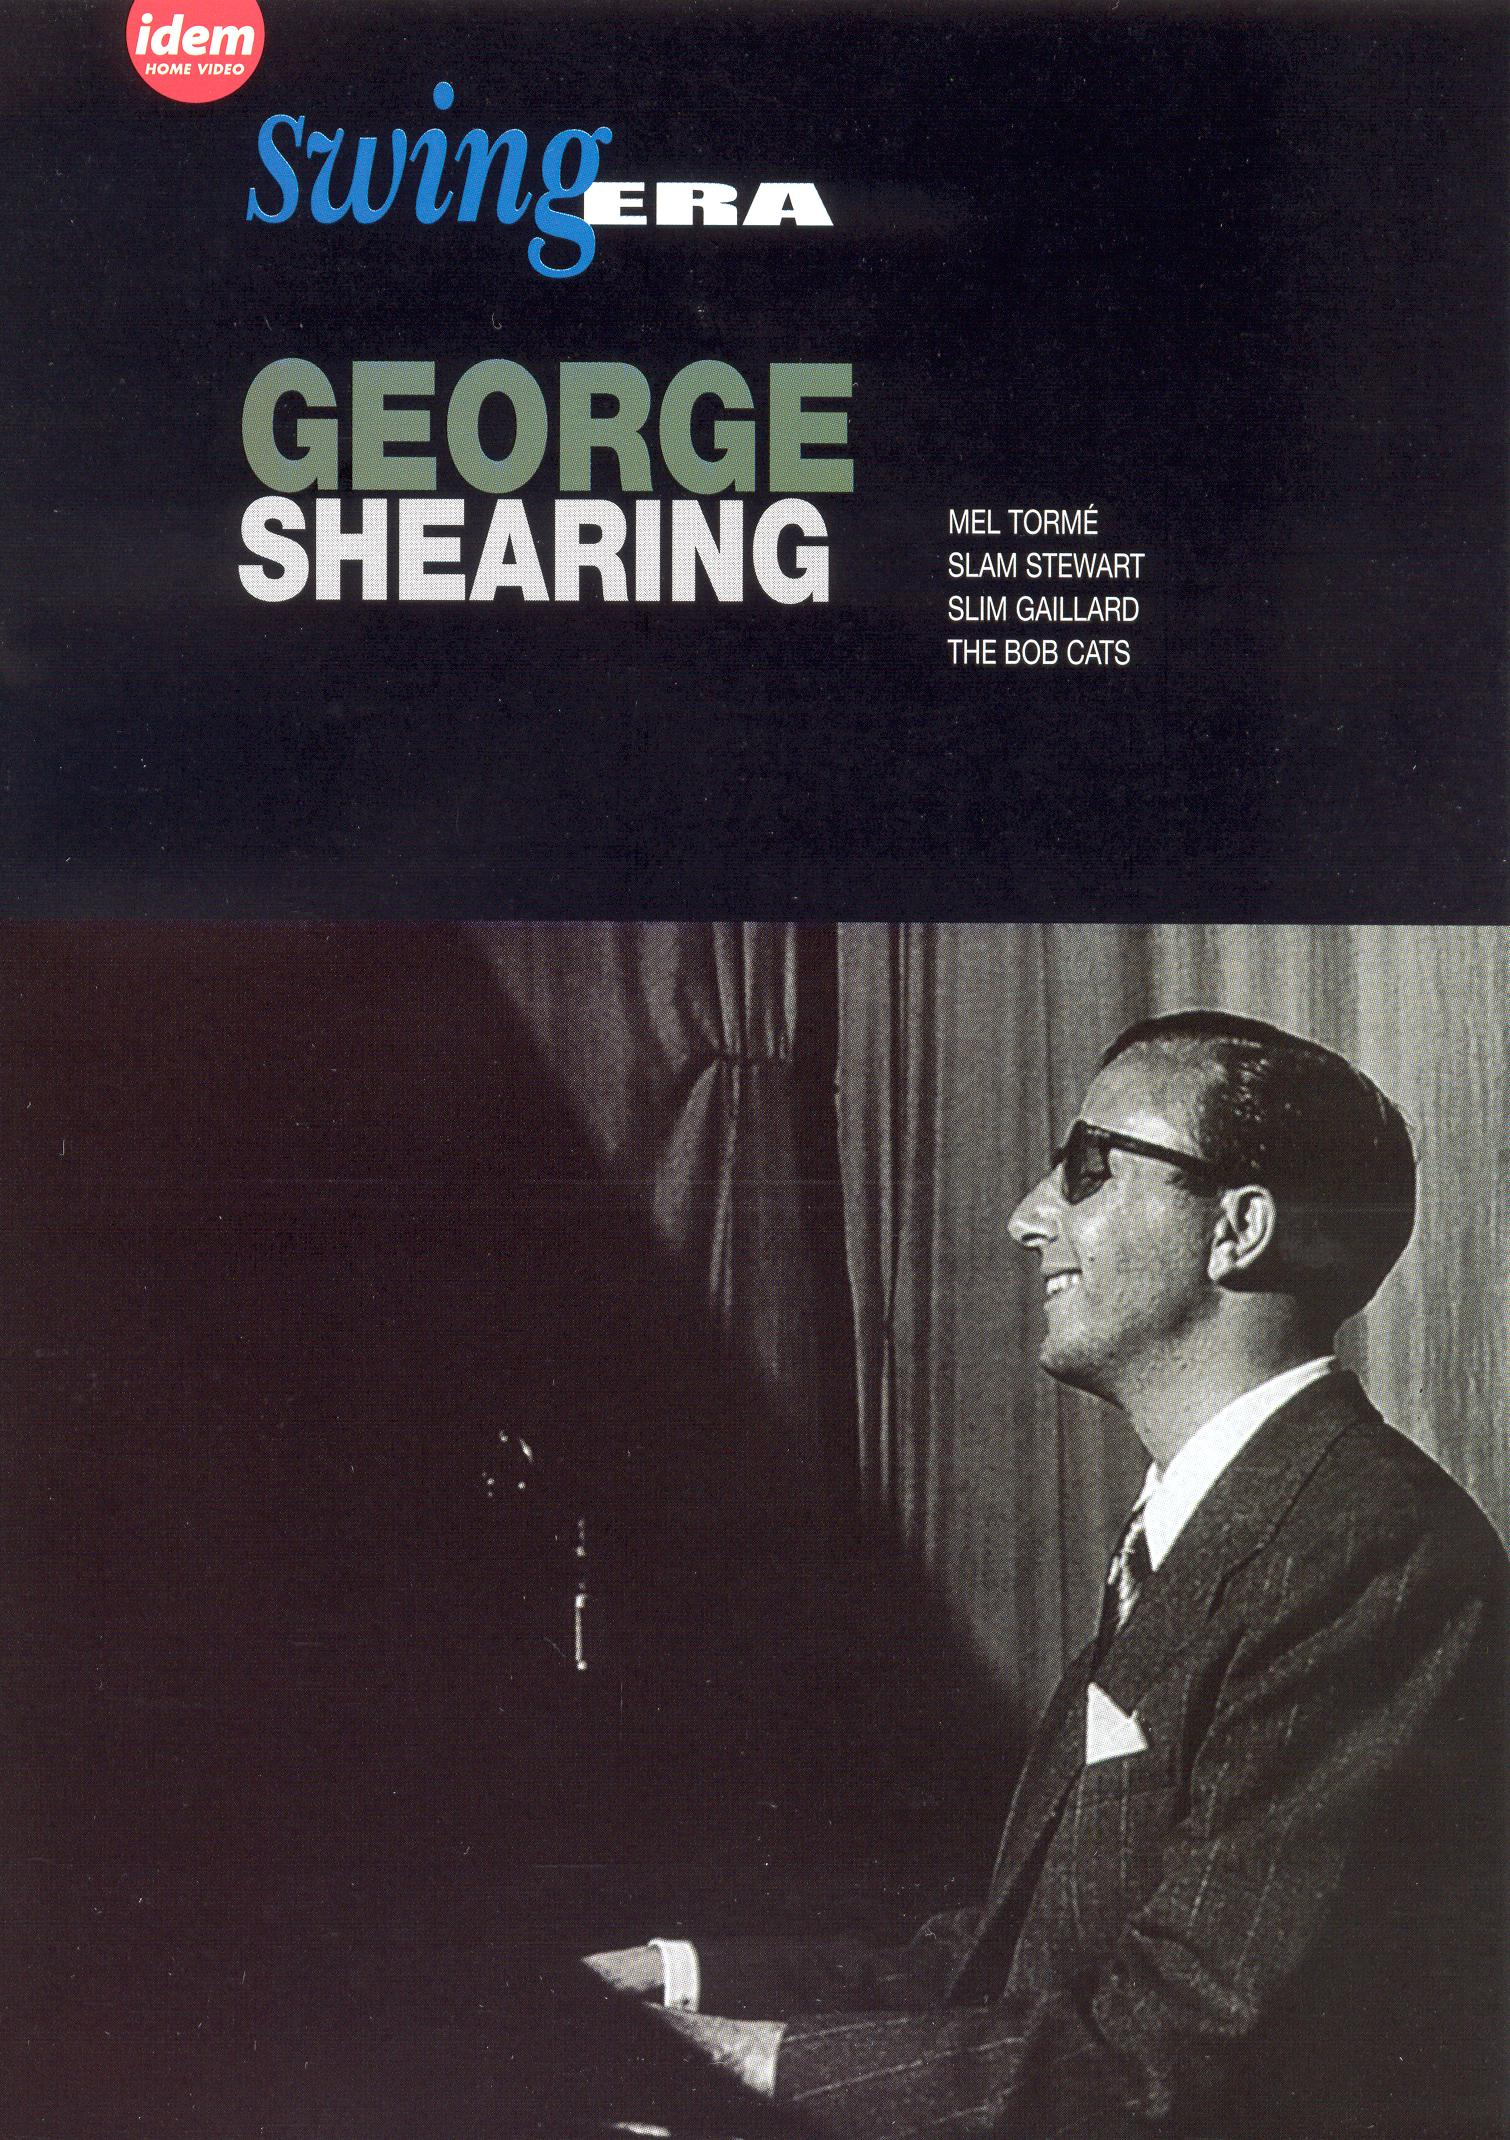 Swing Era: George Shearing